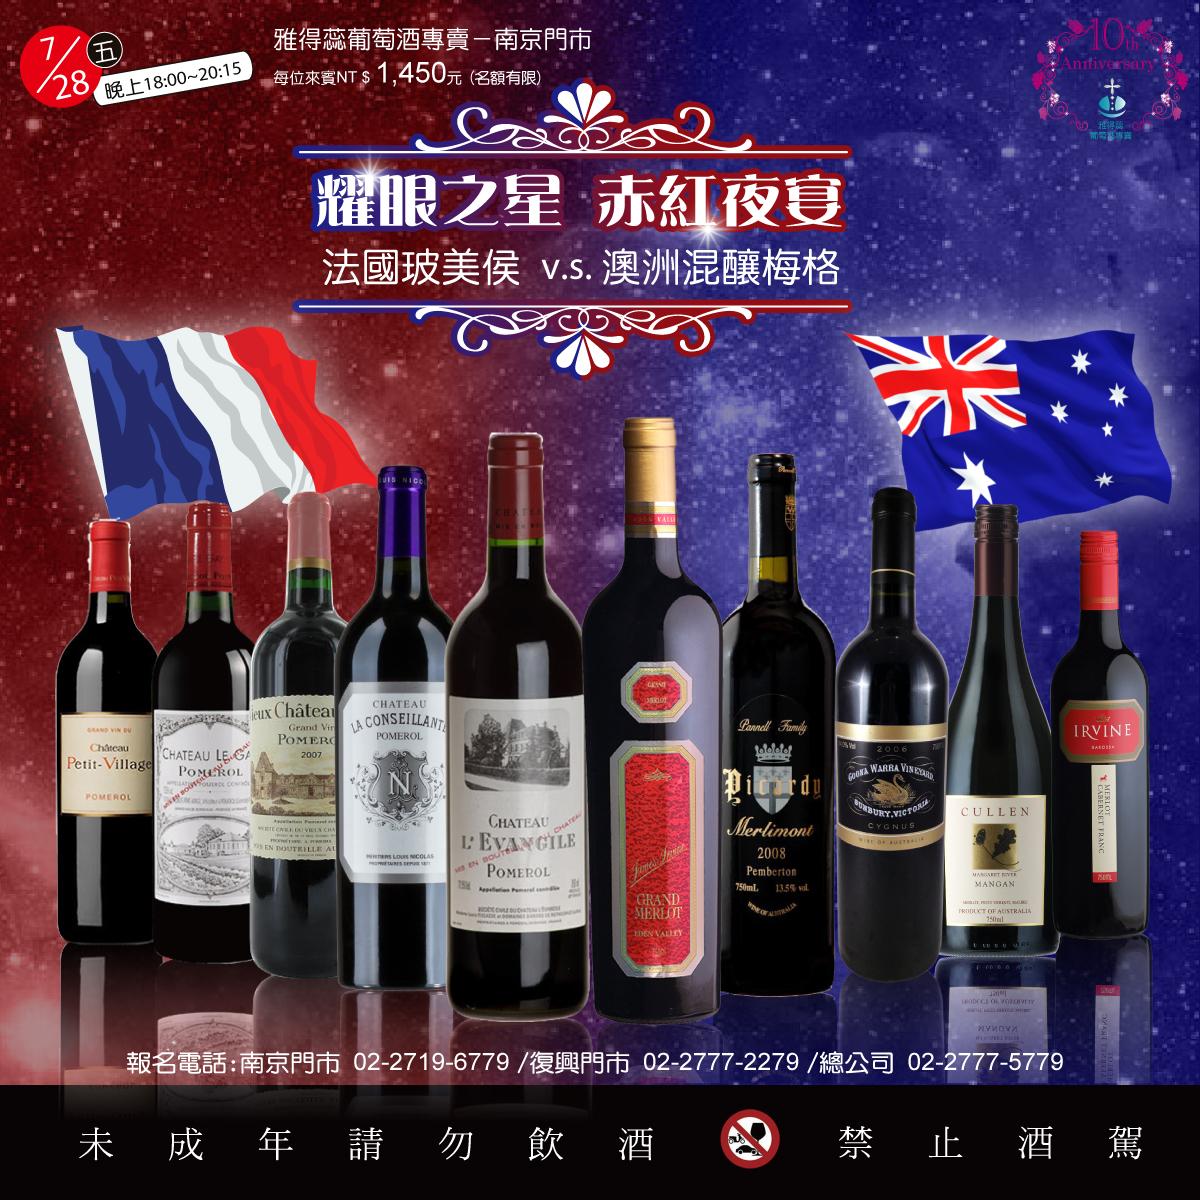 20170728-fb廣告_波美候酒展.jpg